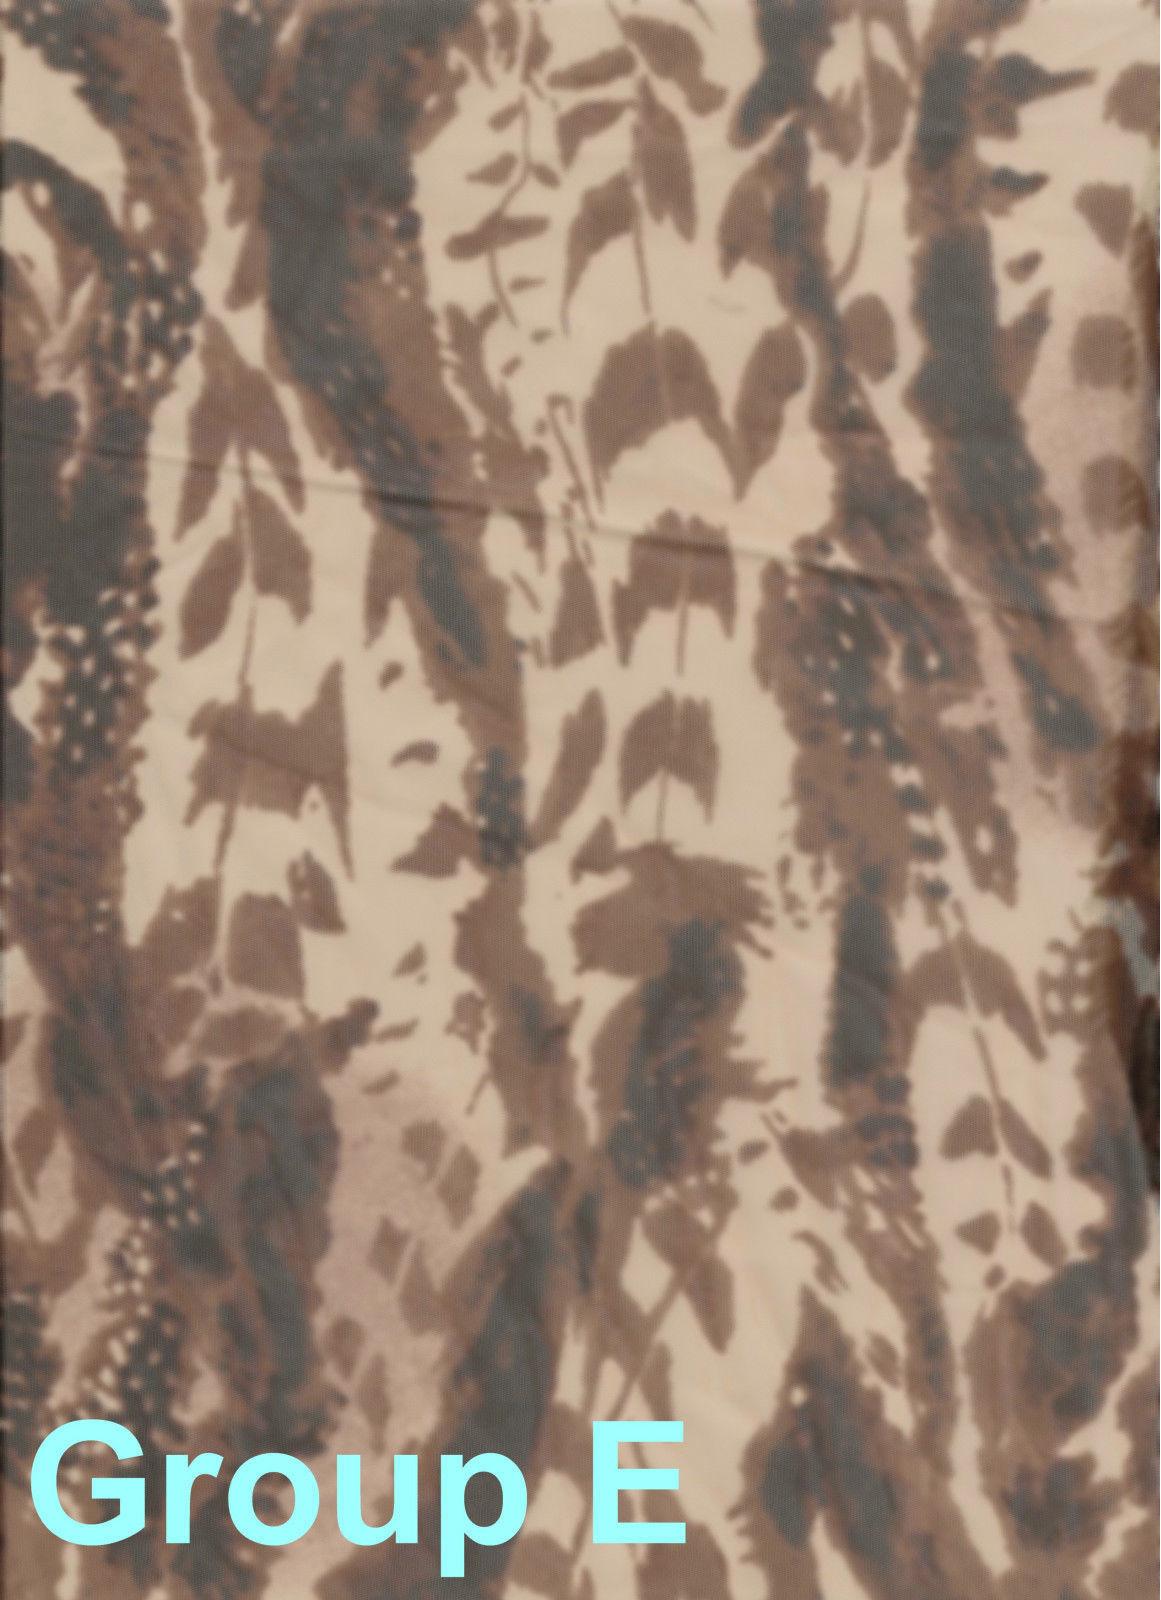 SAFARI AFRICAN Animal Elephant Giraffe Quilt Upholstery Scarf Sew Tiger Fabric